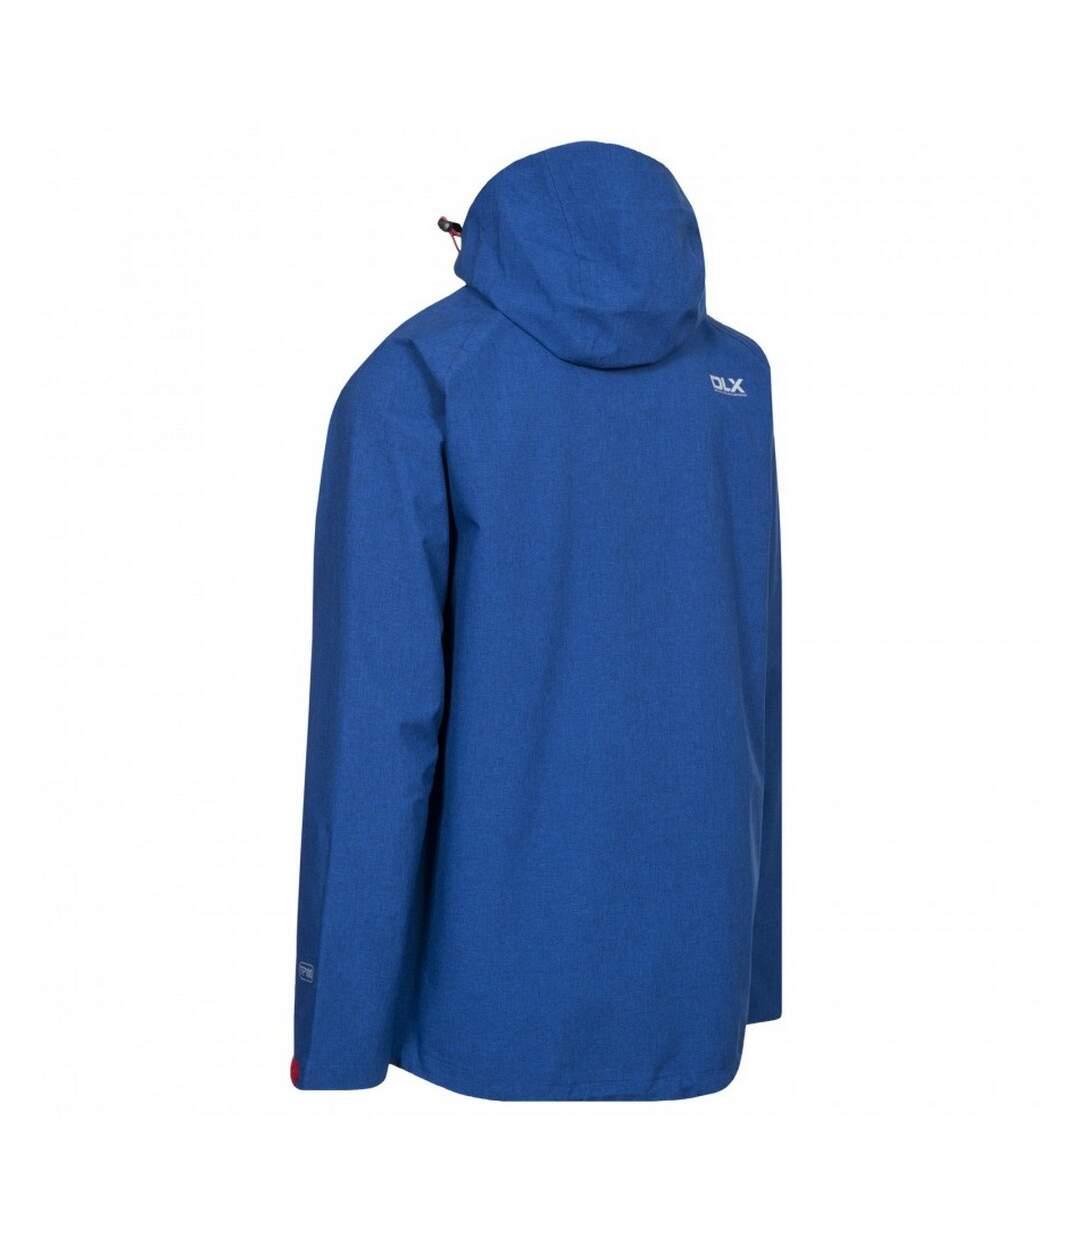 Trespass Mens Caspar II Waterproof Shell Jacket (Twilight Marl) - UTTP4066